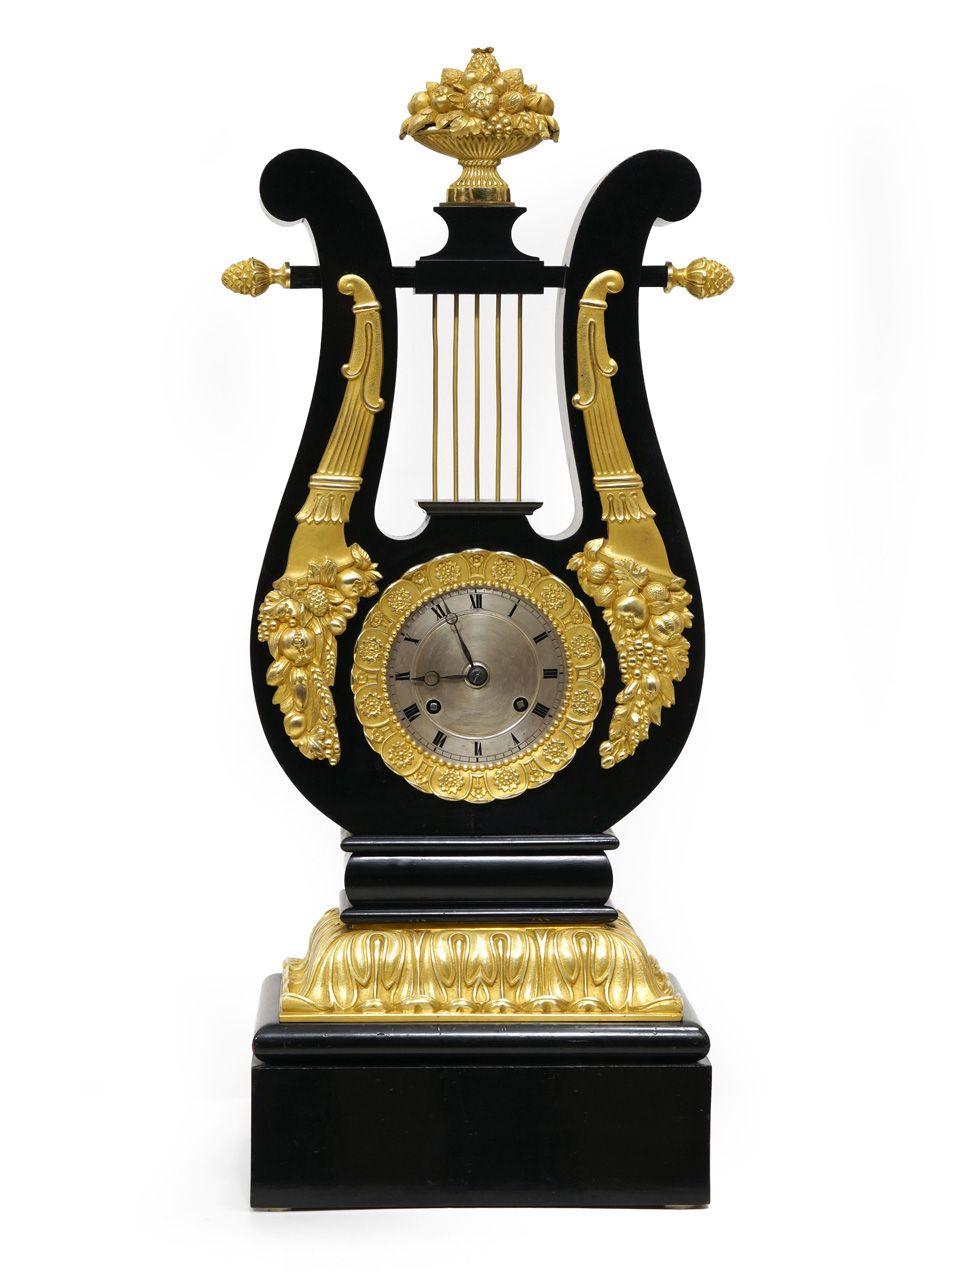 Antiquitäten Am Markt Tübingen Uhren Barock Antike Uhren Klassische Uhr Antike Wanduhren